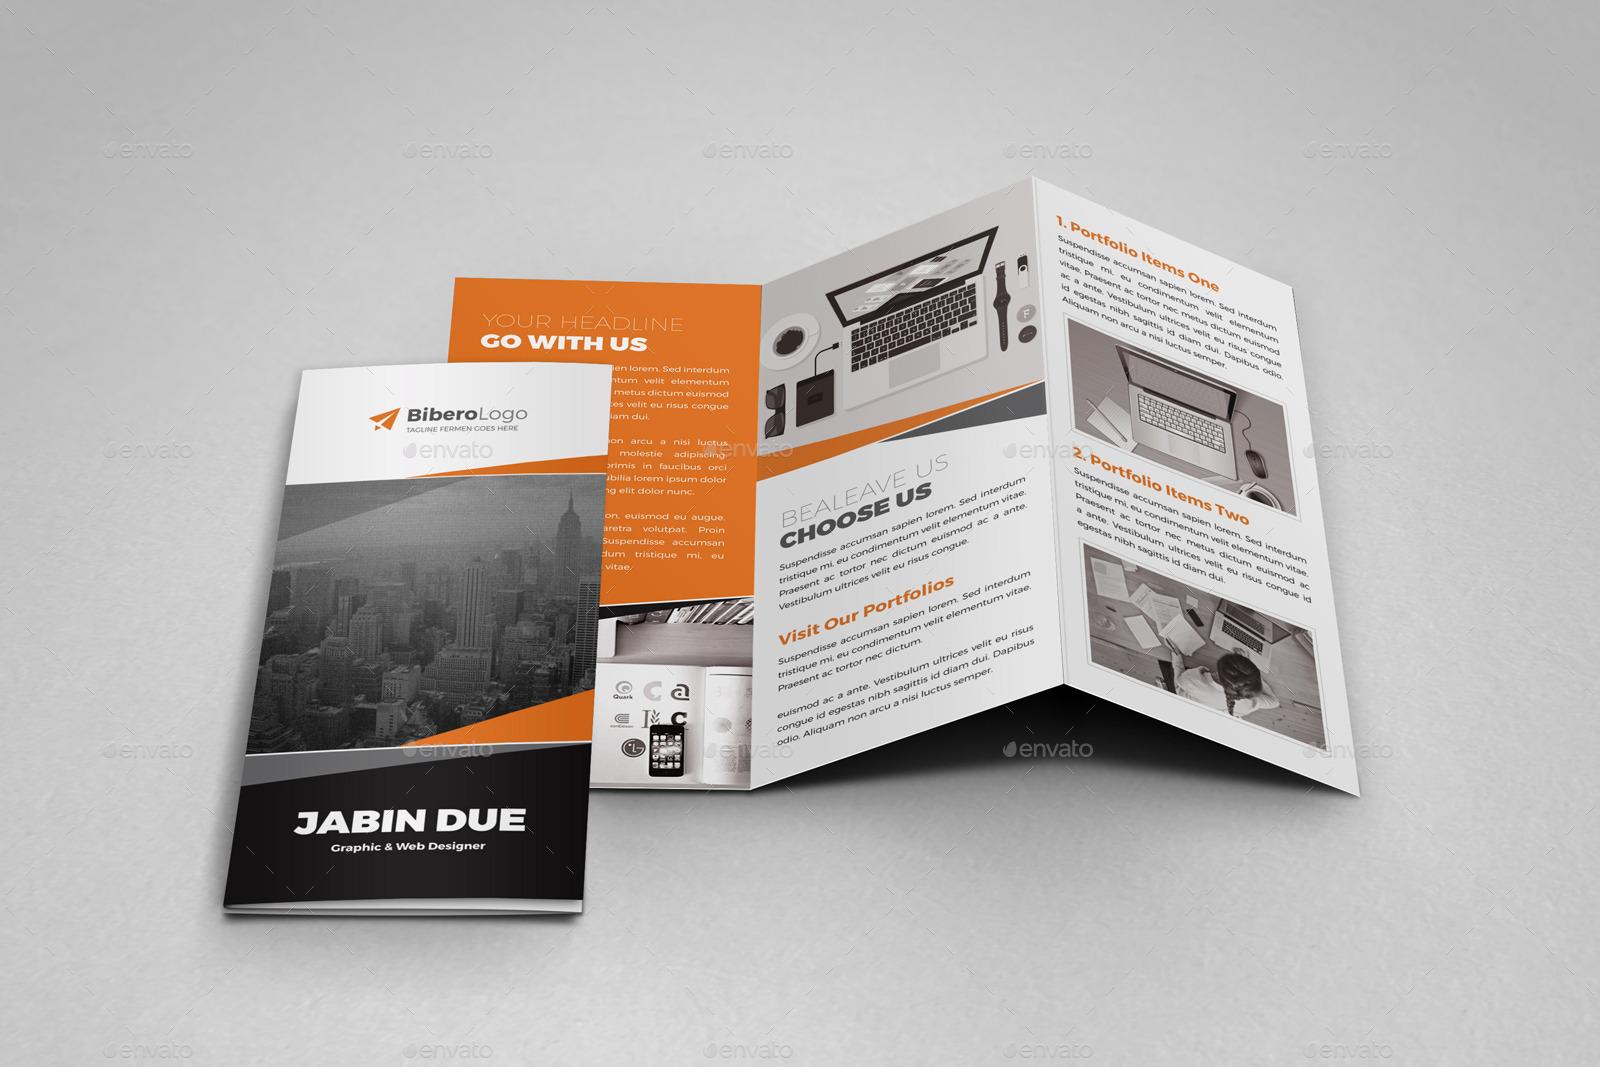 Portfolio Trifold Brochure Indesign Template by Jbn-Comilla ...